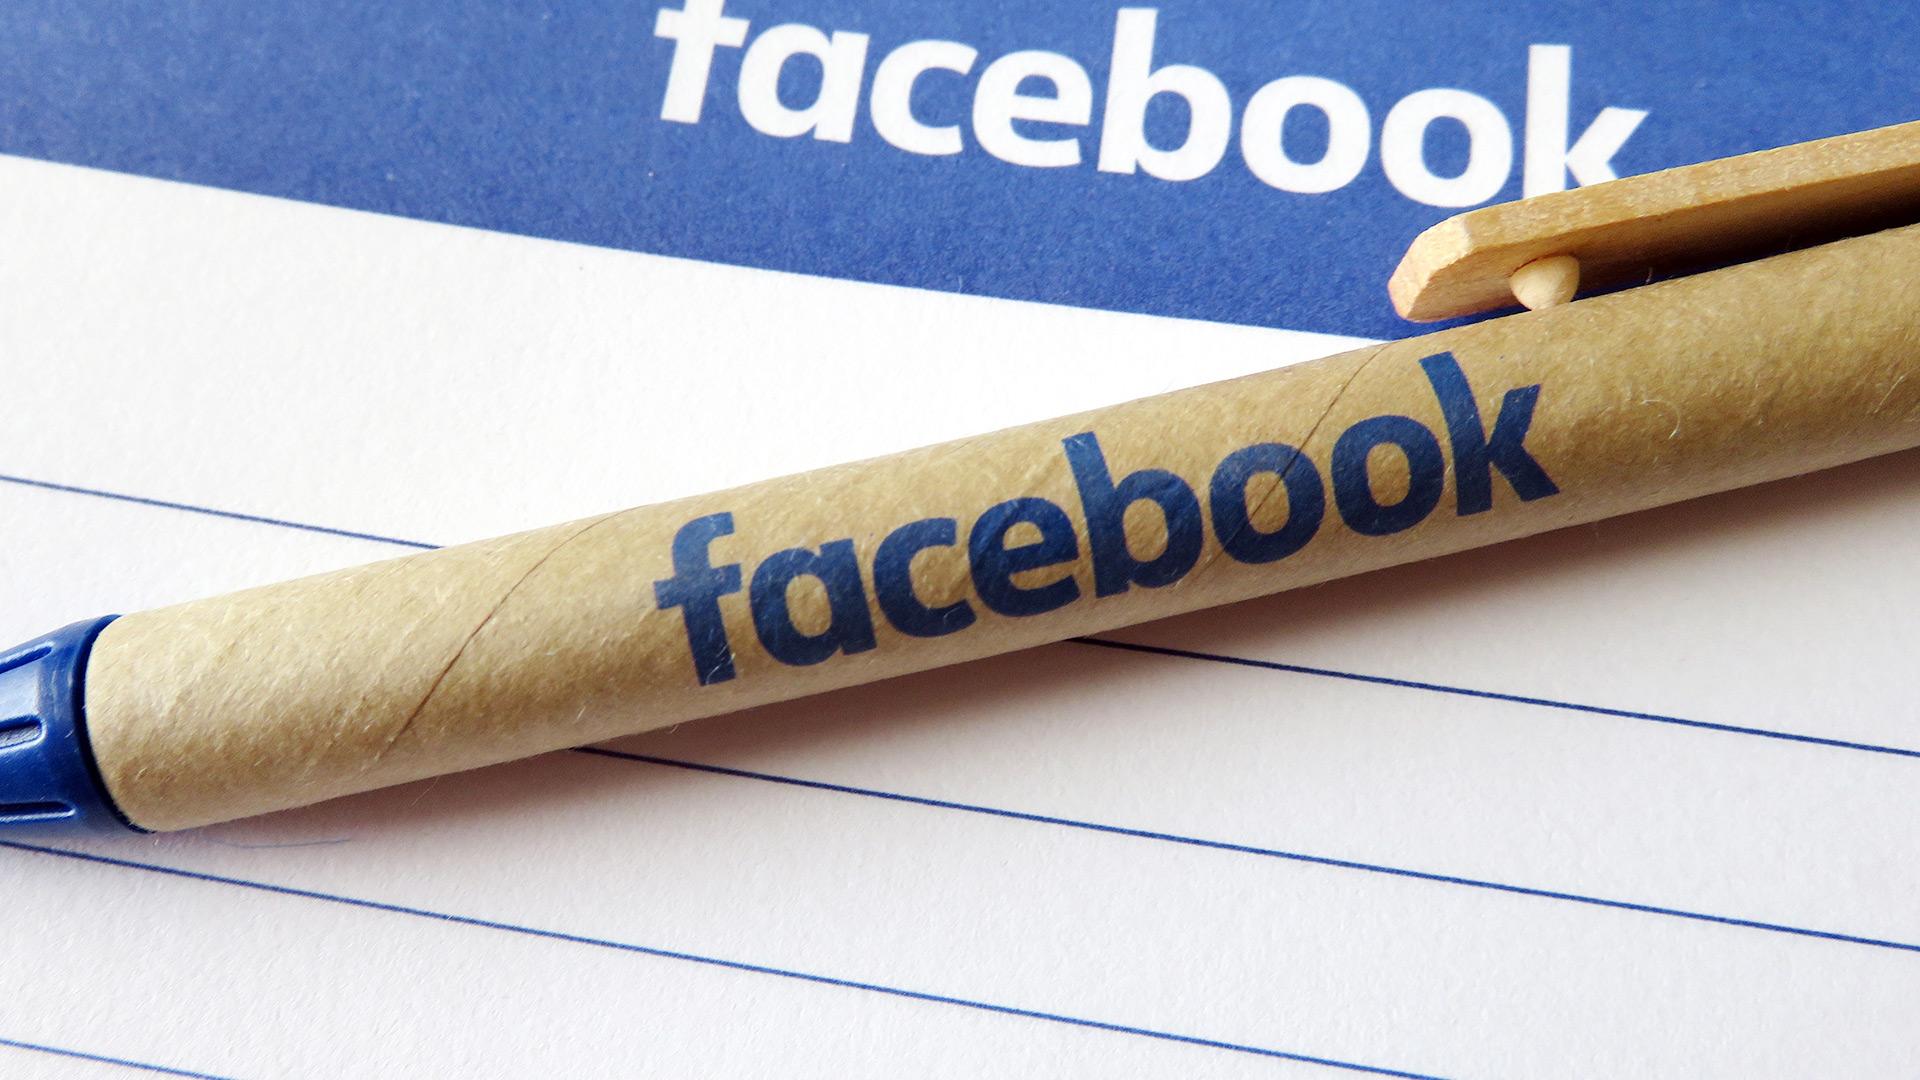 facebook-logo-notepad2-1920